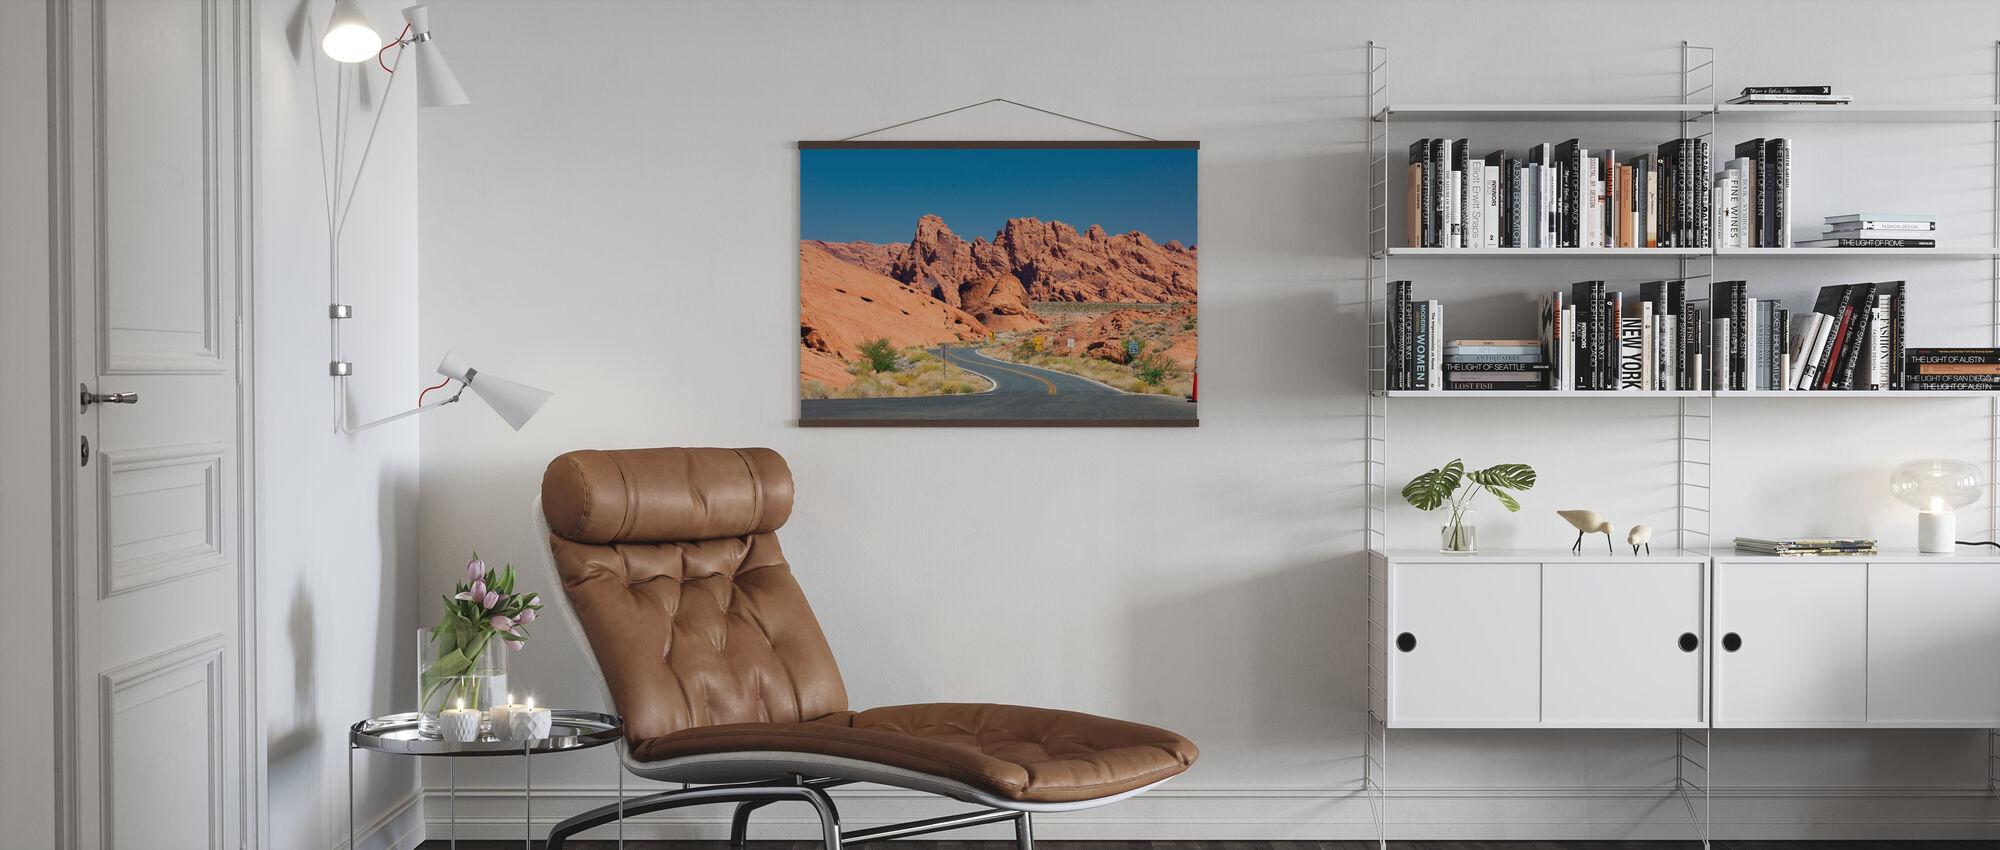 Brann i Nevada, USA - Plakat - Stue